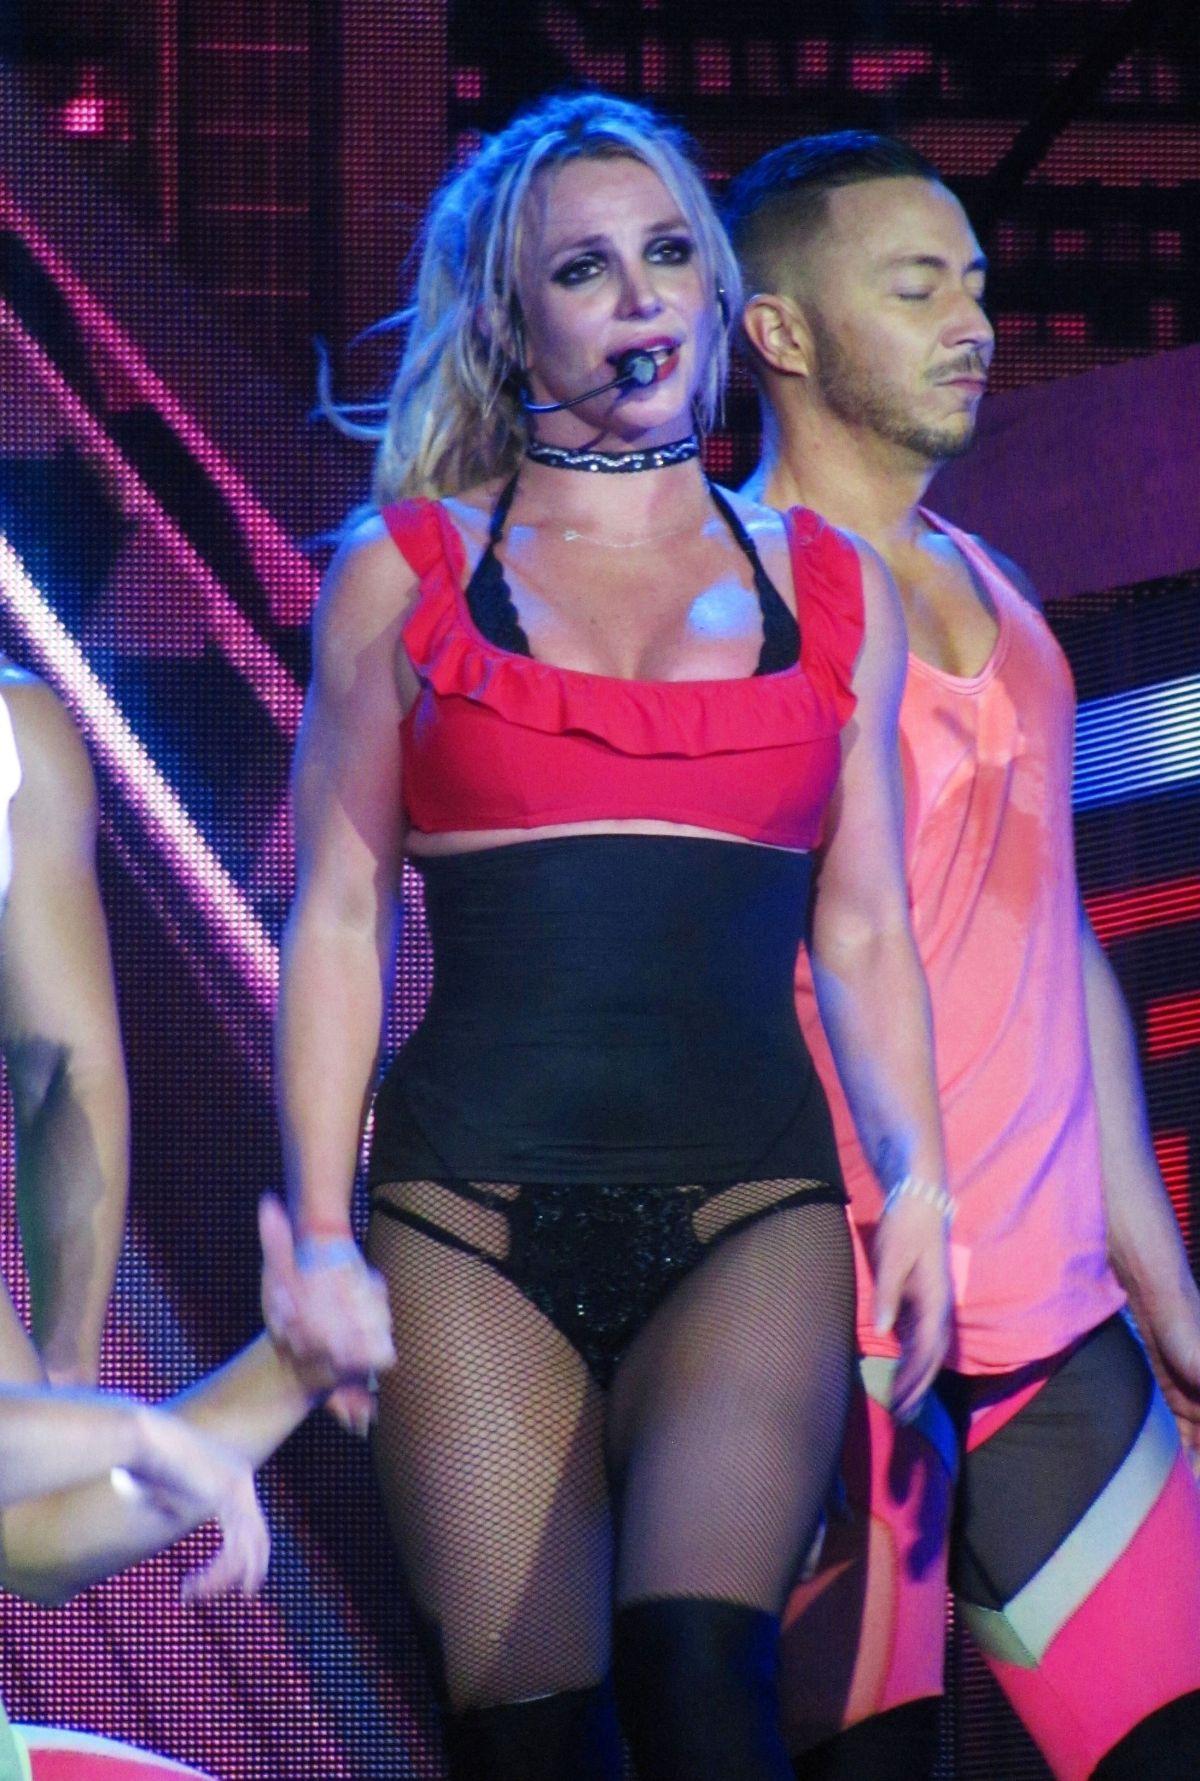 Photos leak from Britney's 2013 Shape Magazine photoshoot - Entertainment  News - Gaga Daily